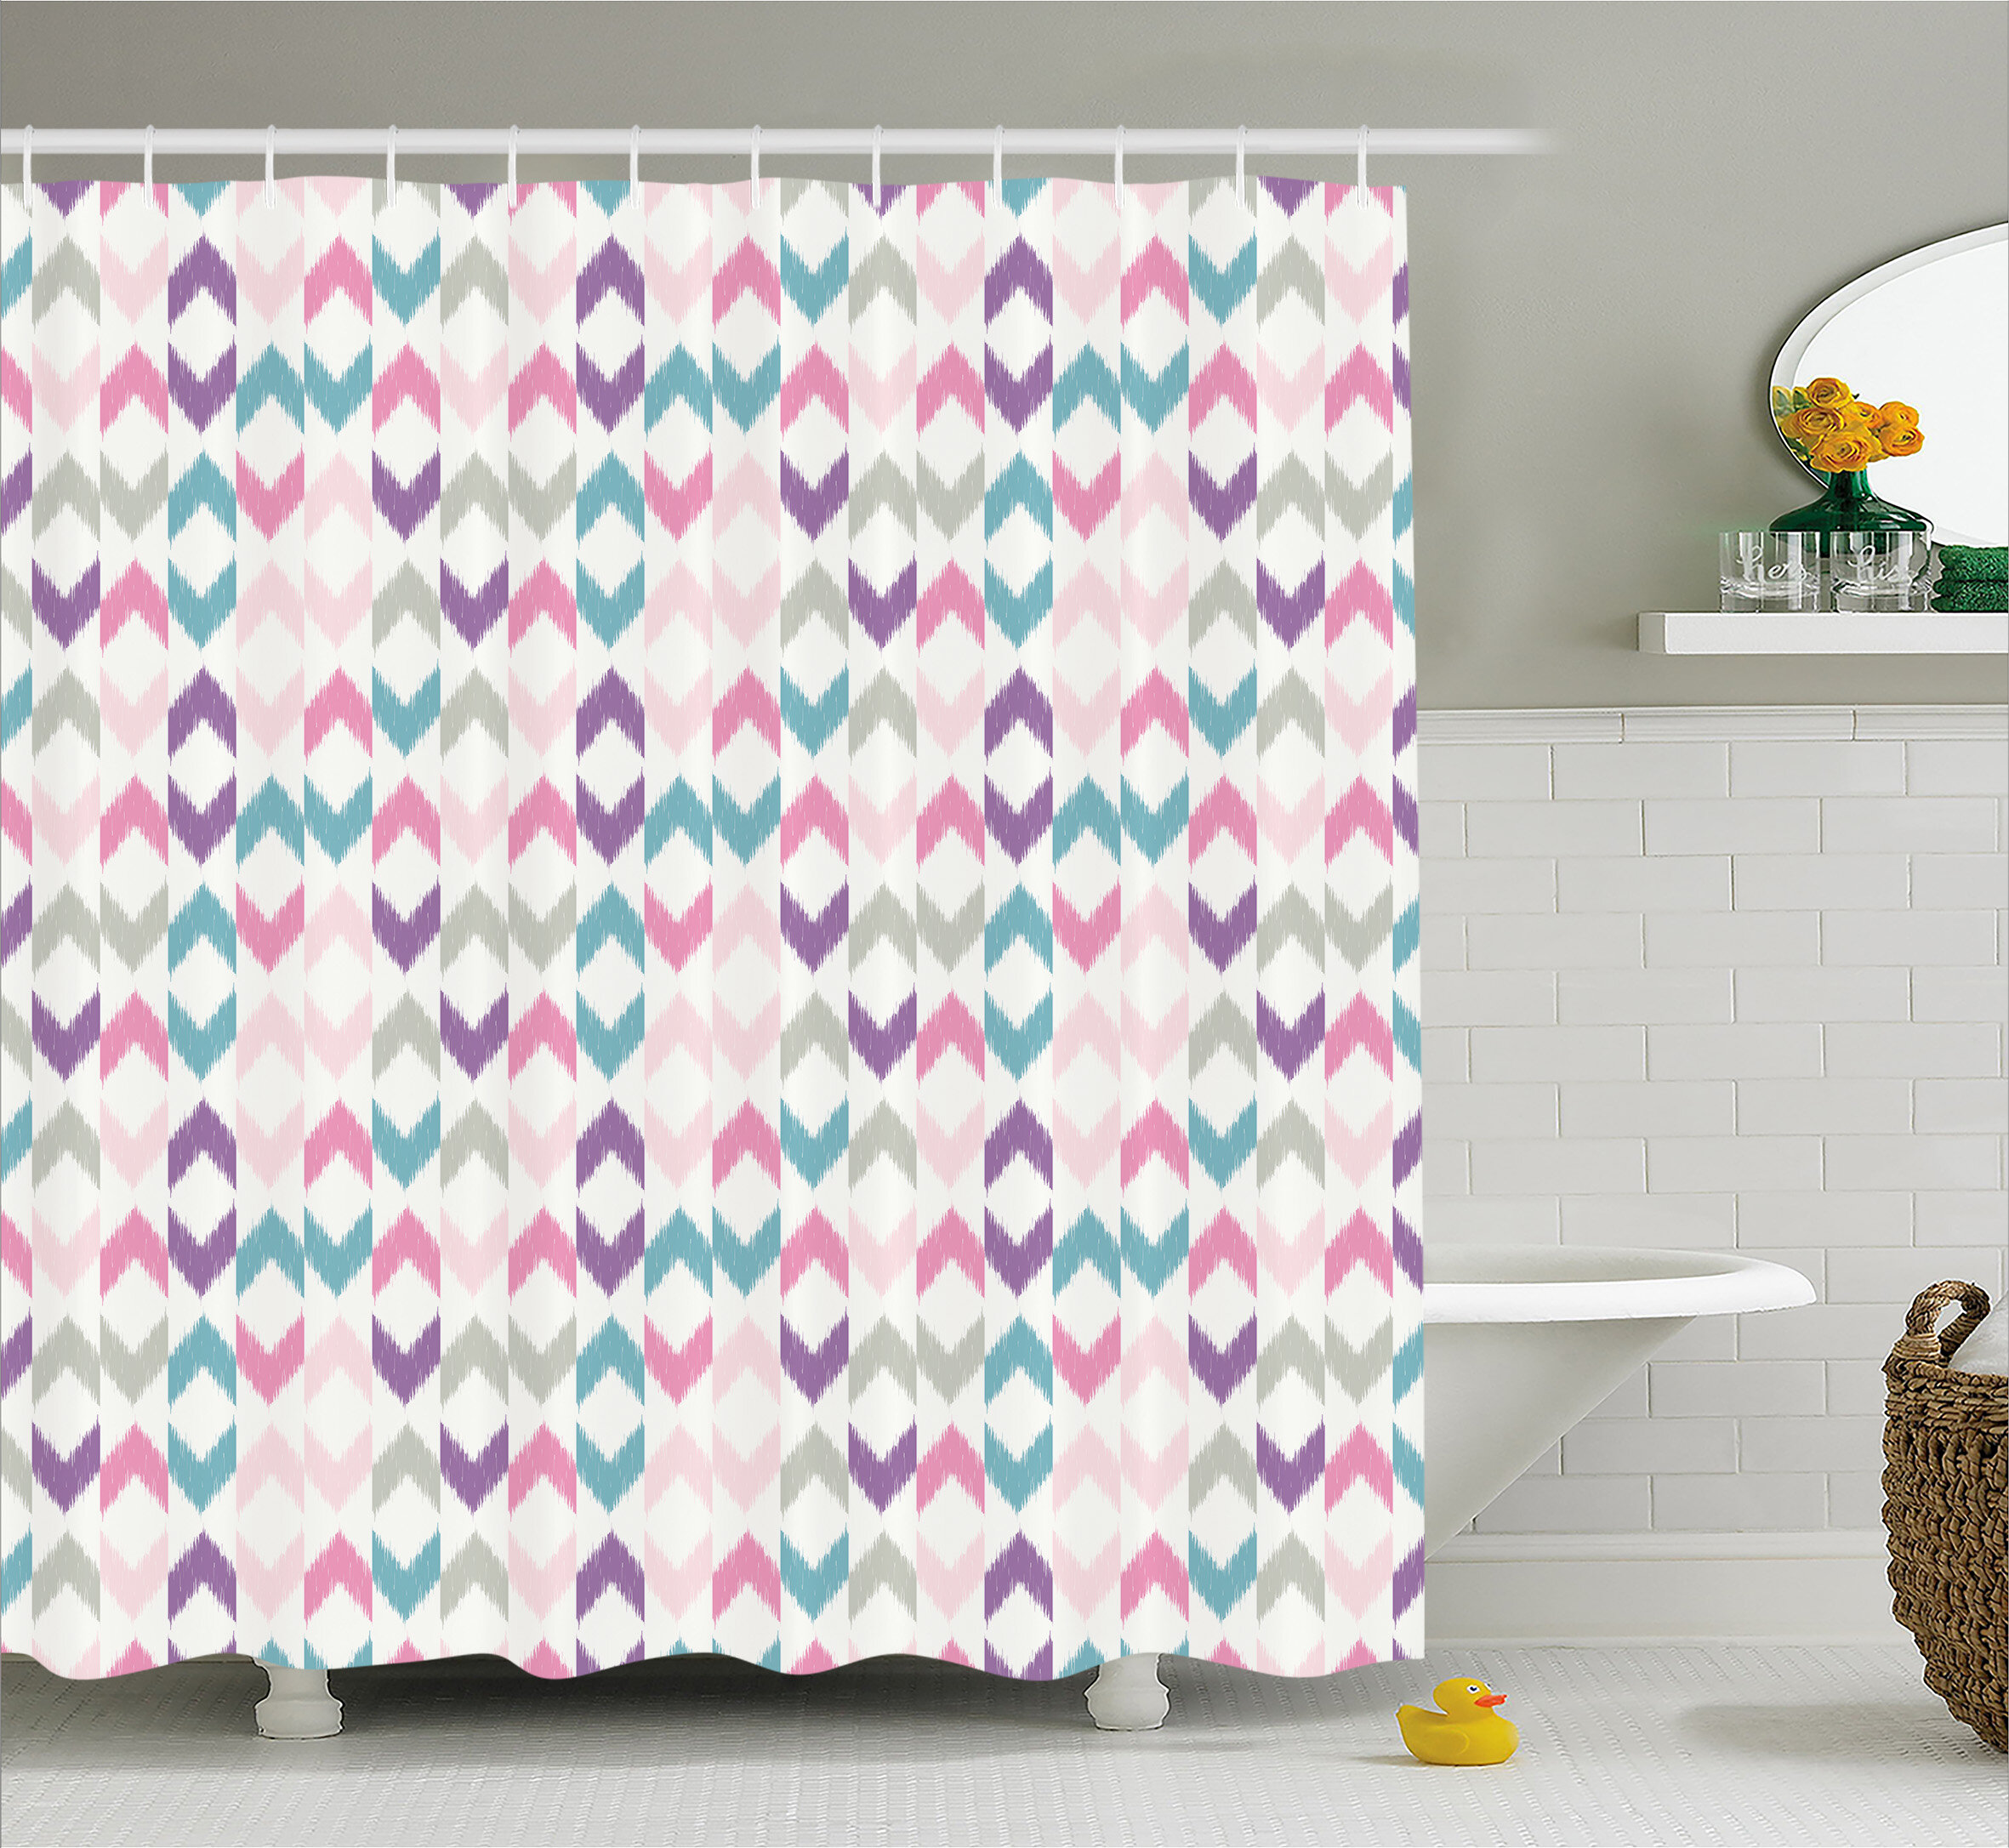 Harriet Bee Adonis Eastern Chevron Boho Shower Curtain